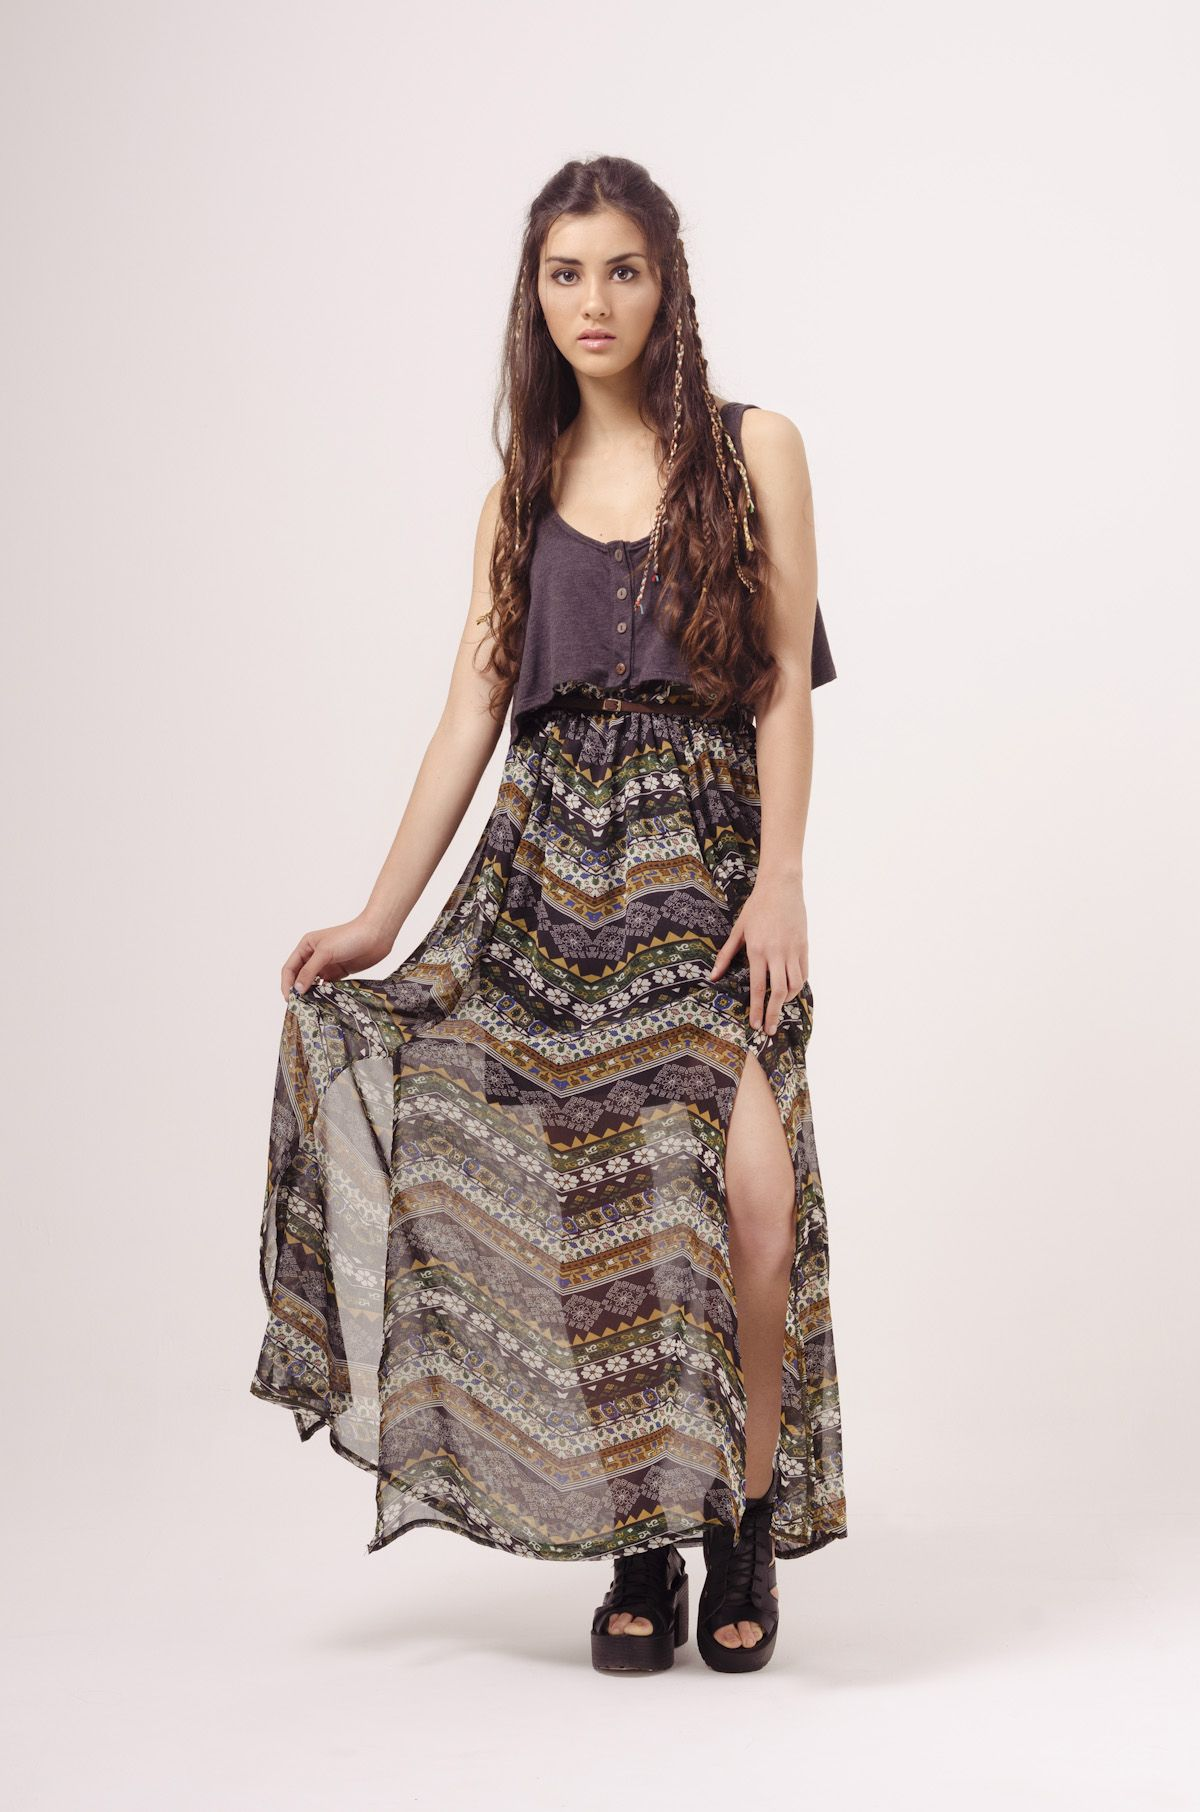 #fashion #clothing #dress #boho #hippie #style | Clothes ...